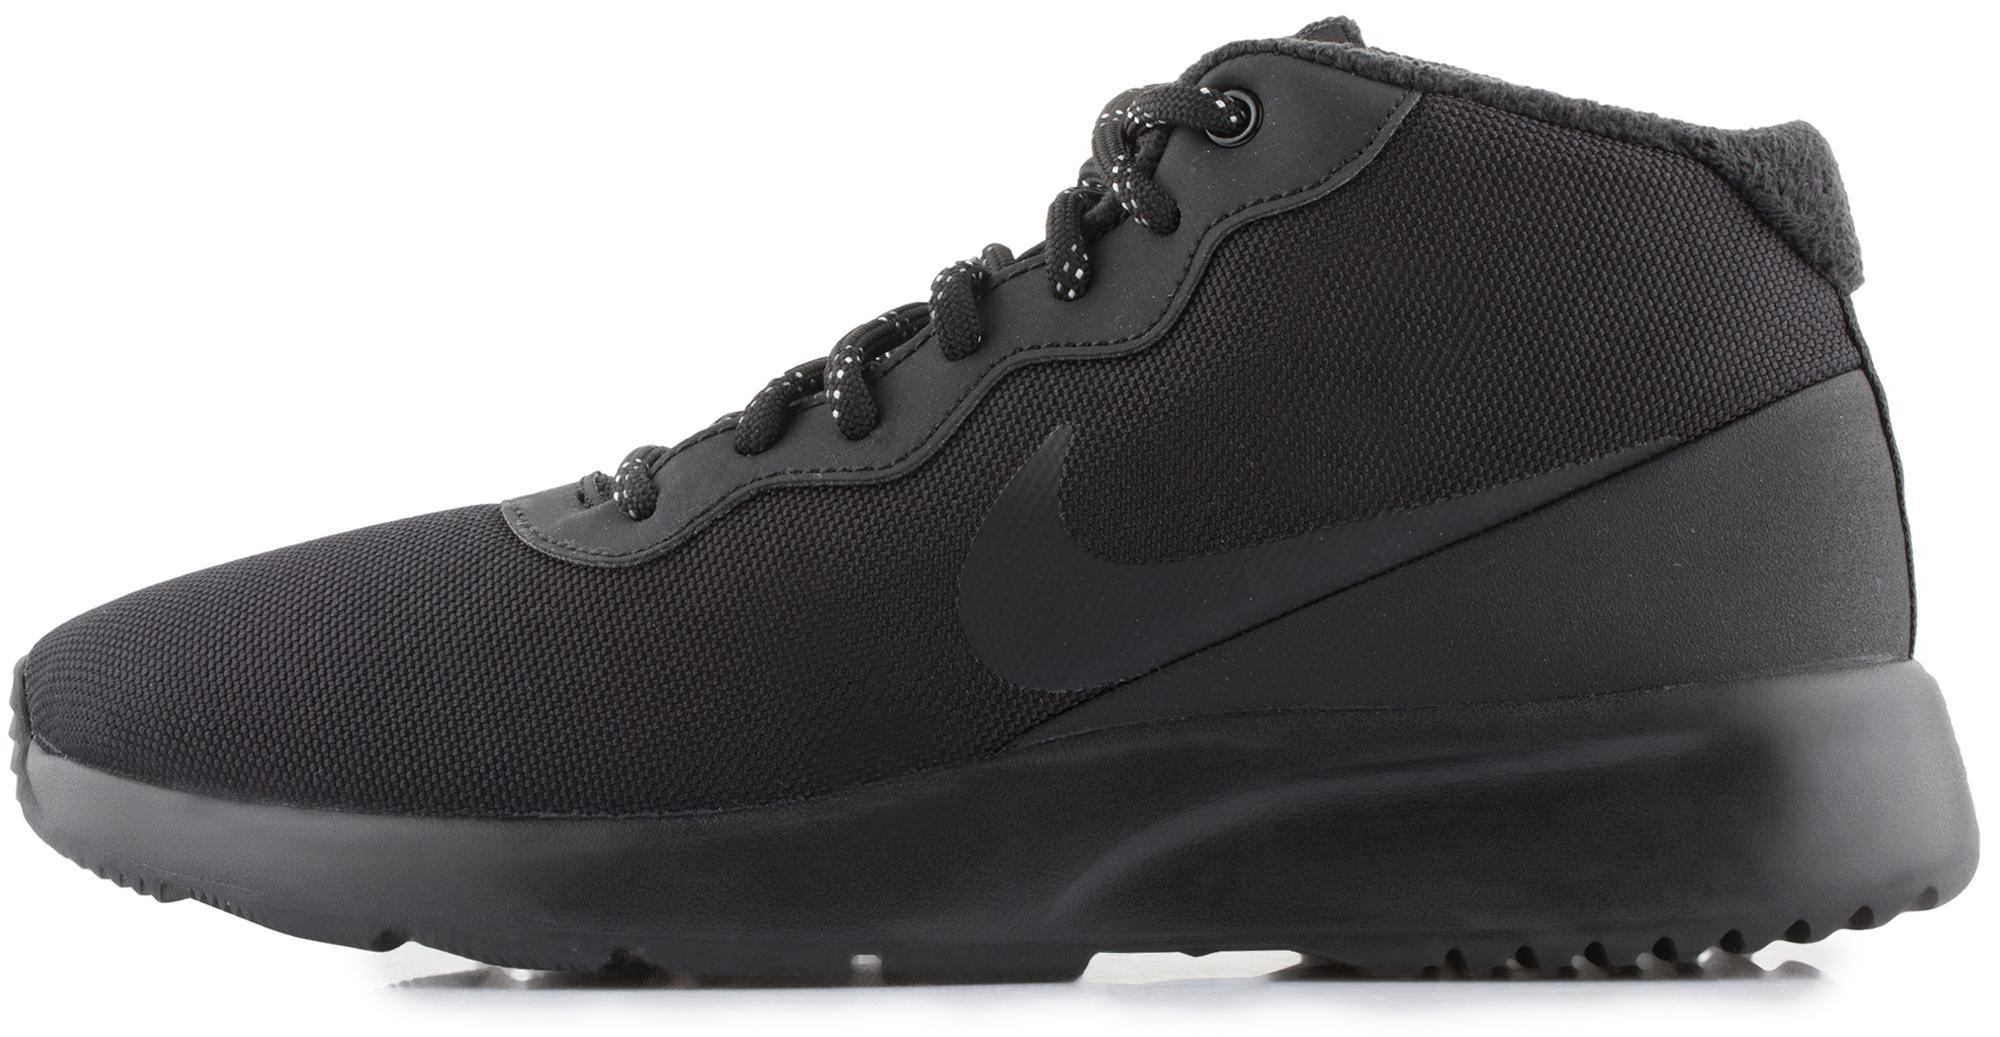 Nike Кроссовки мужские Nike Tanjun Chukka, размер 46,5 nike перчатки мужские nike размер l